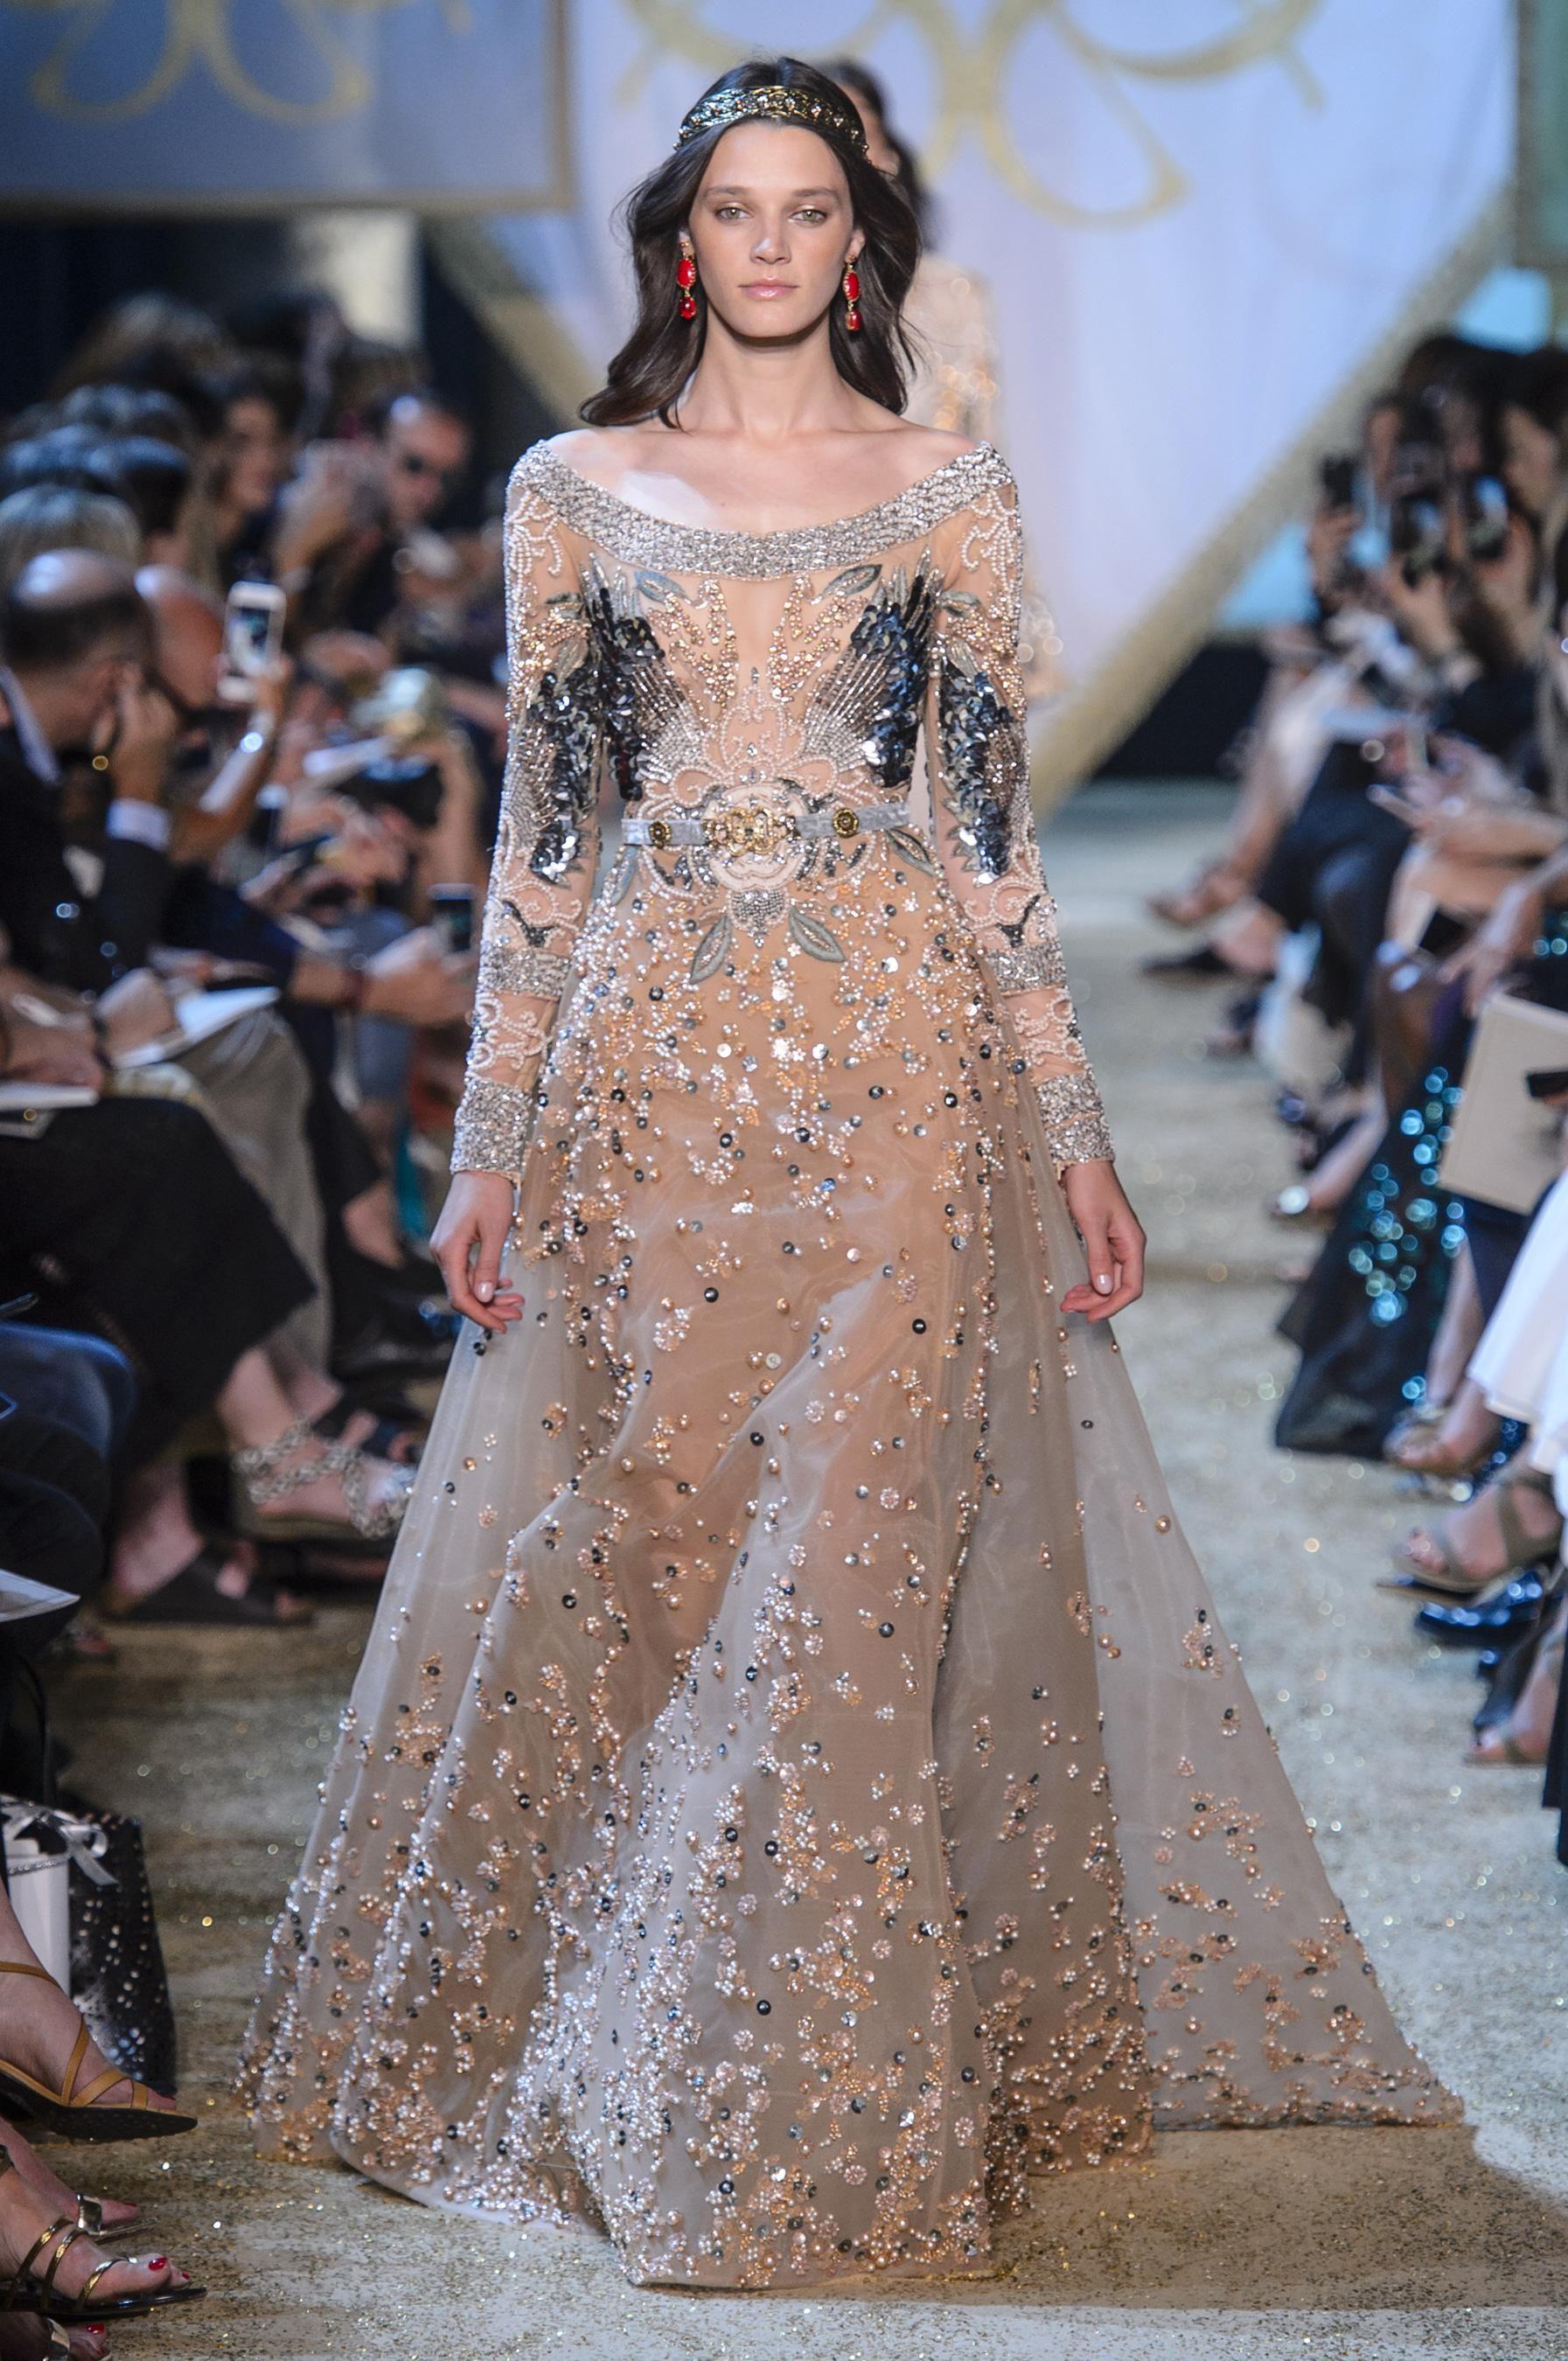 Defile Elie Saab Automne Hiver 2017 2018 Couture Haute Couture Belle Robe De Soiree Mariage Robe Dentelle